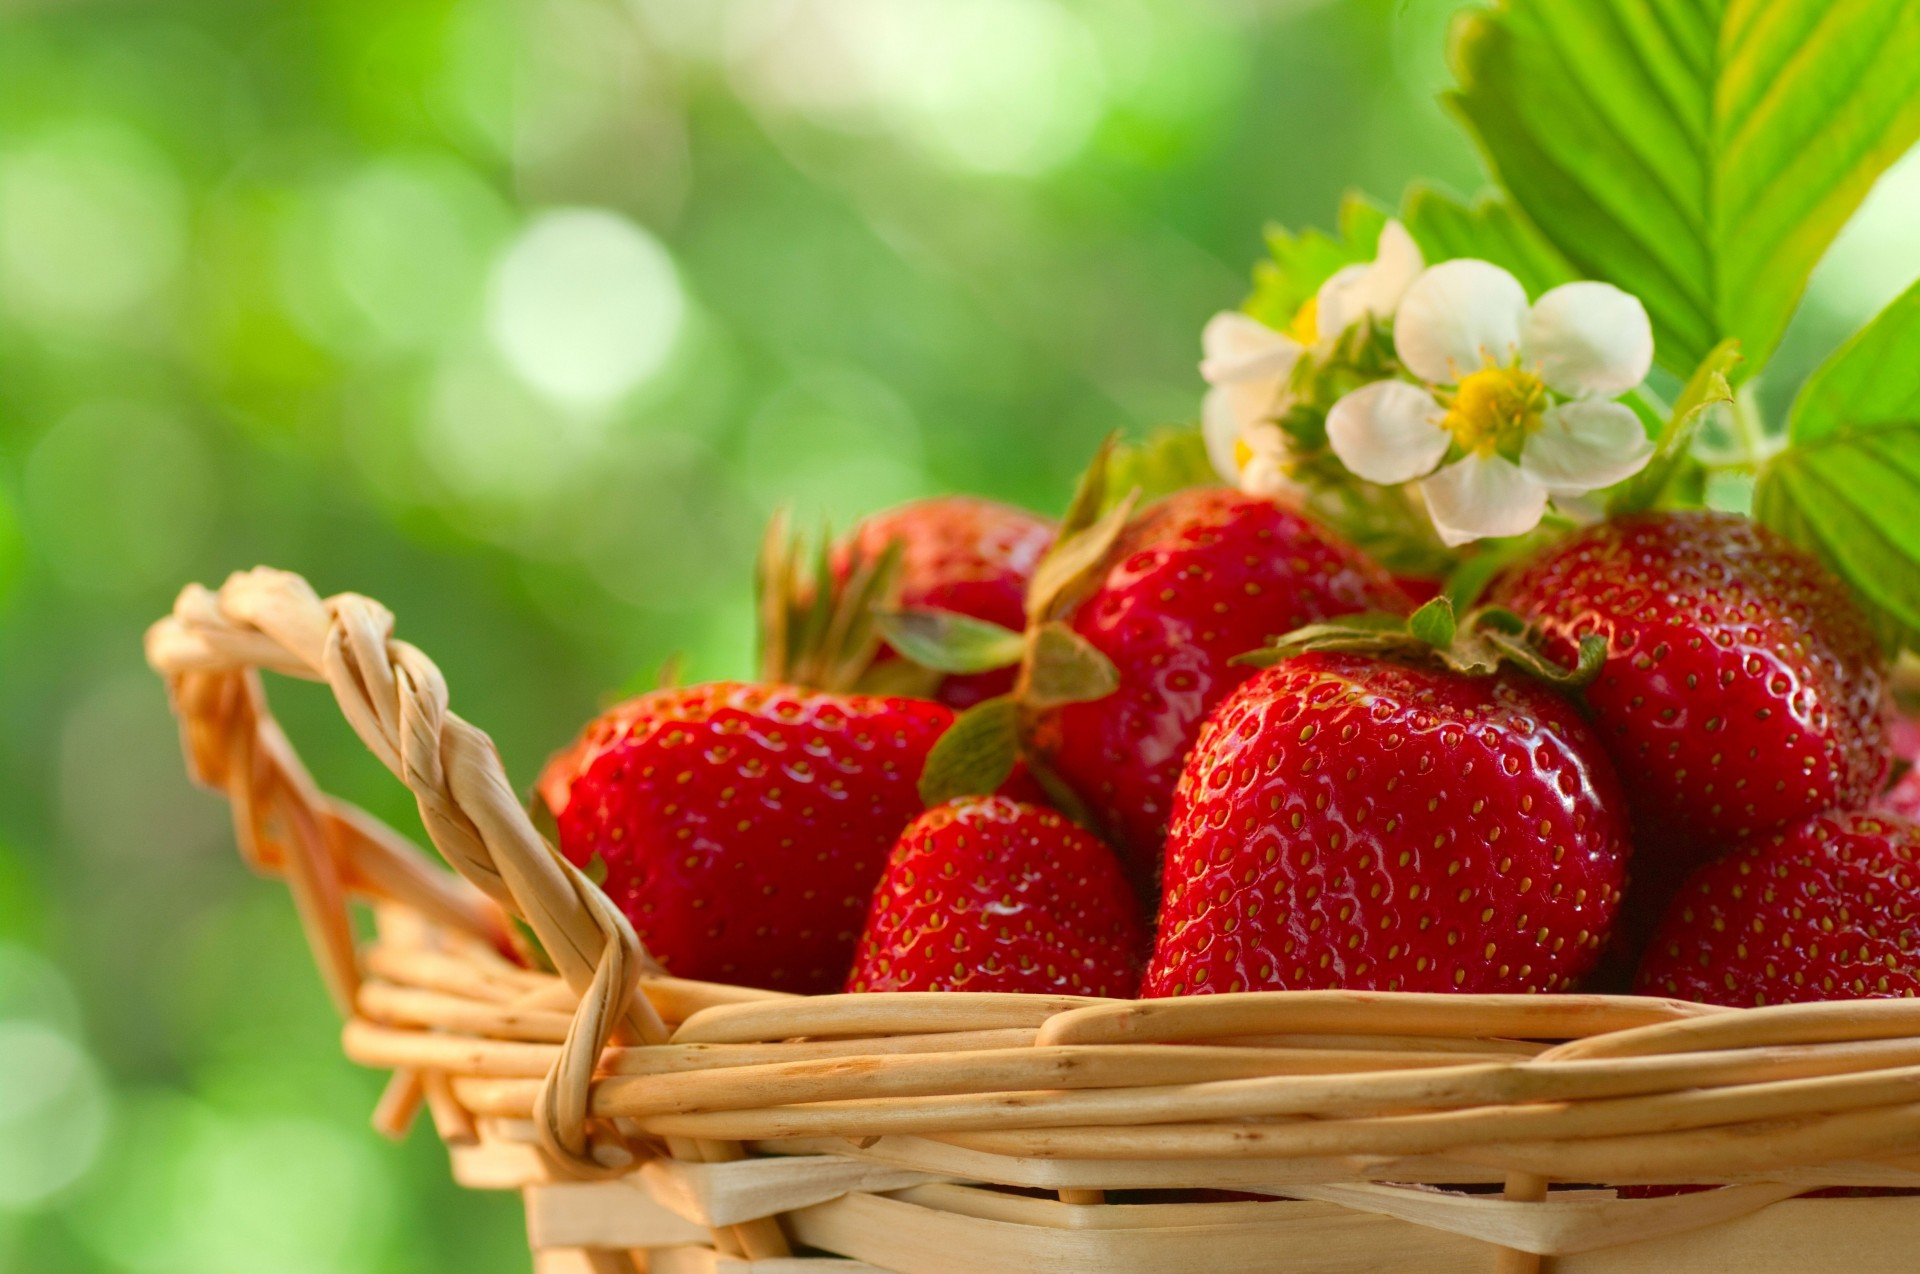 клубника корзина strawberry basket без смс